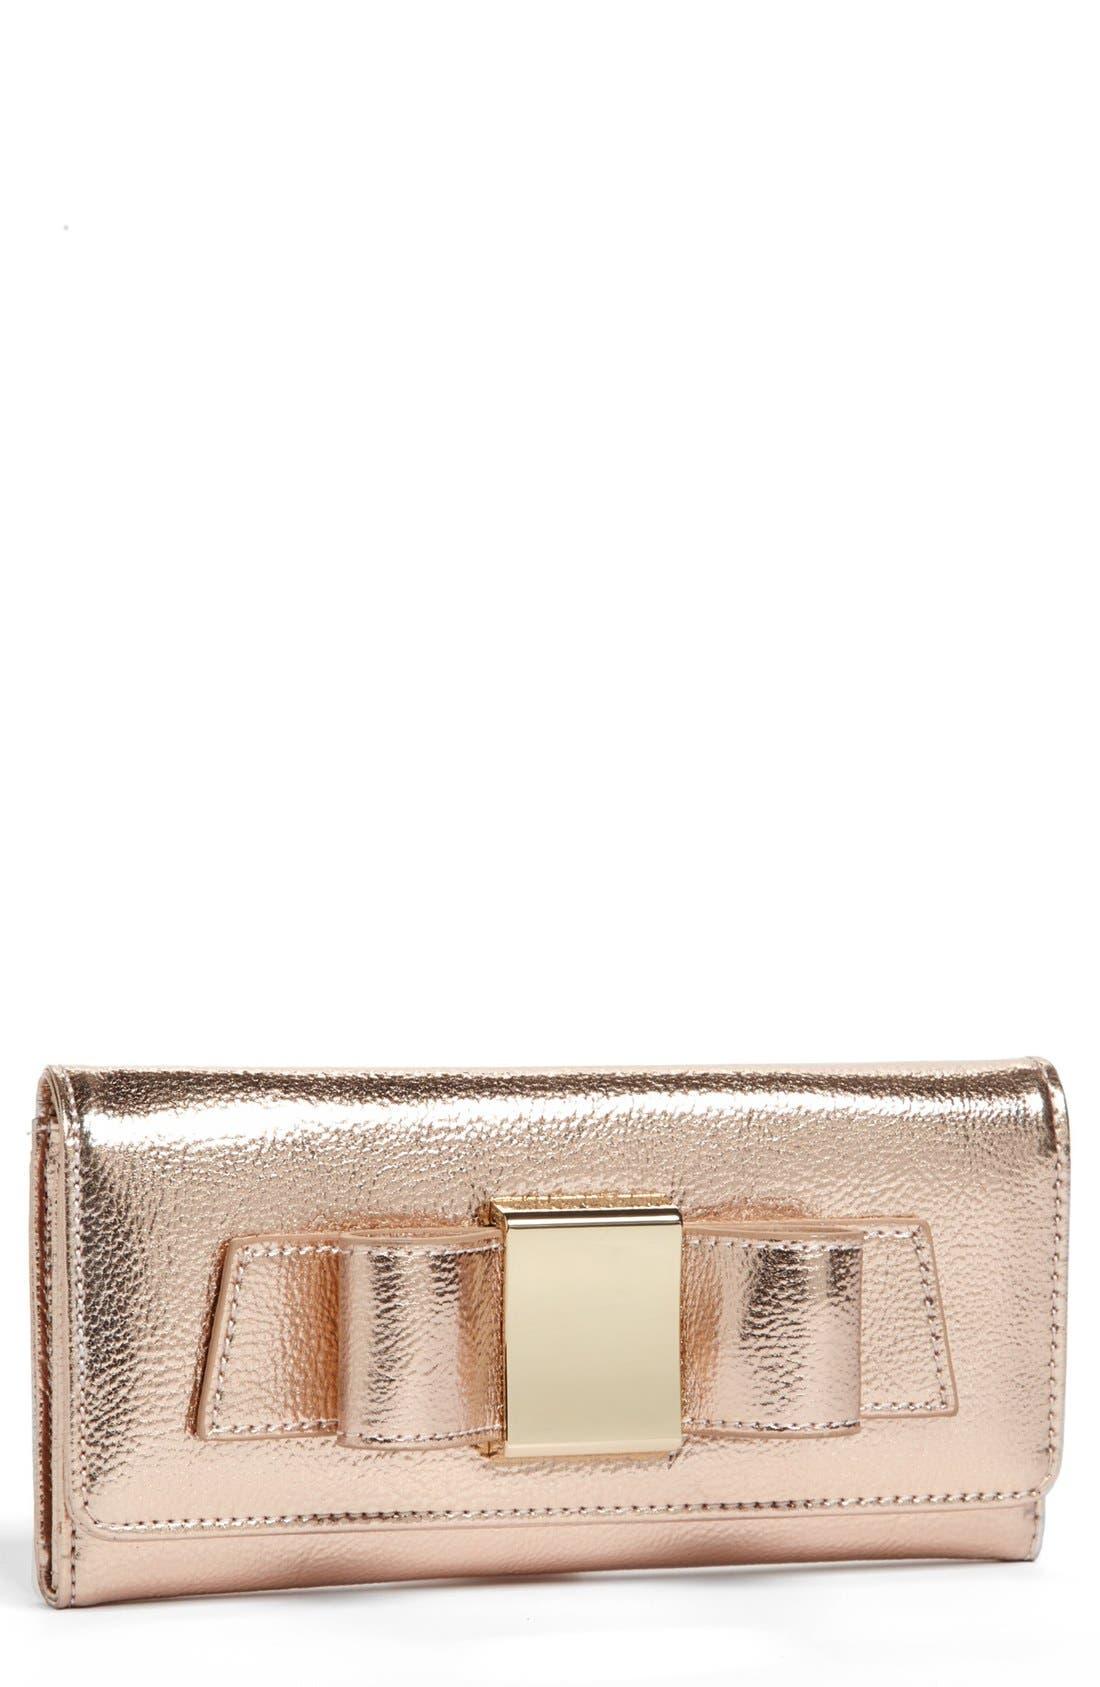 Main Image - Ivanka Trump 'Blair' Metallic Wallet